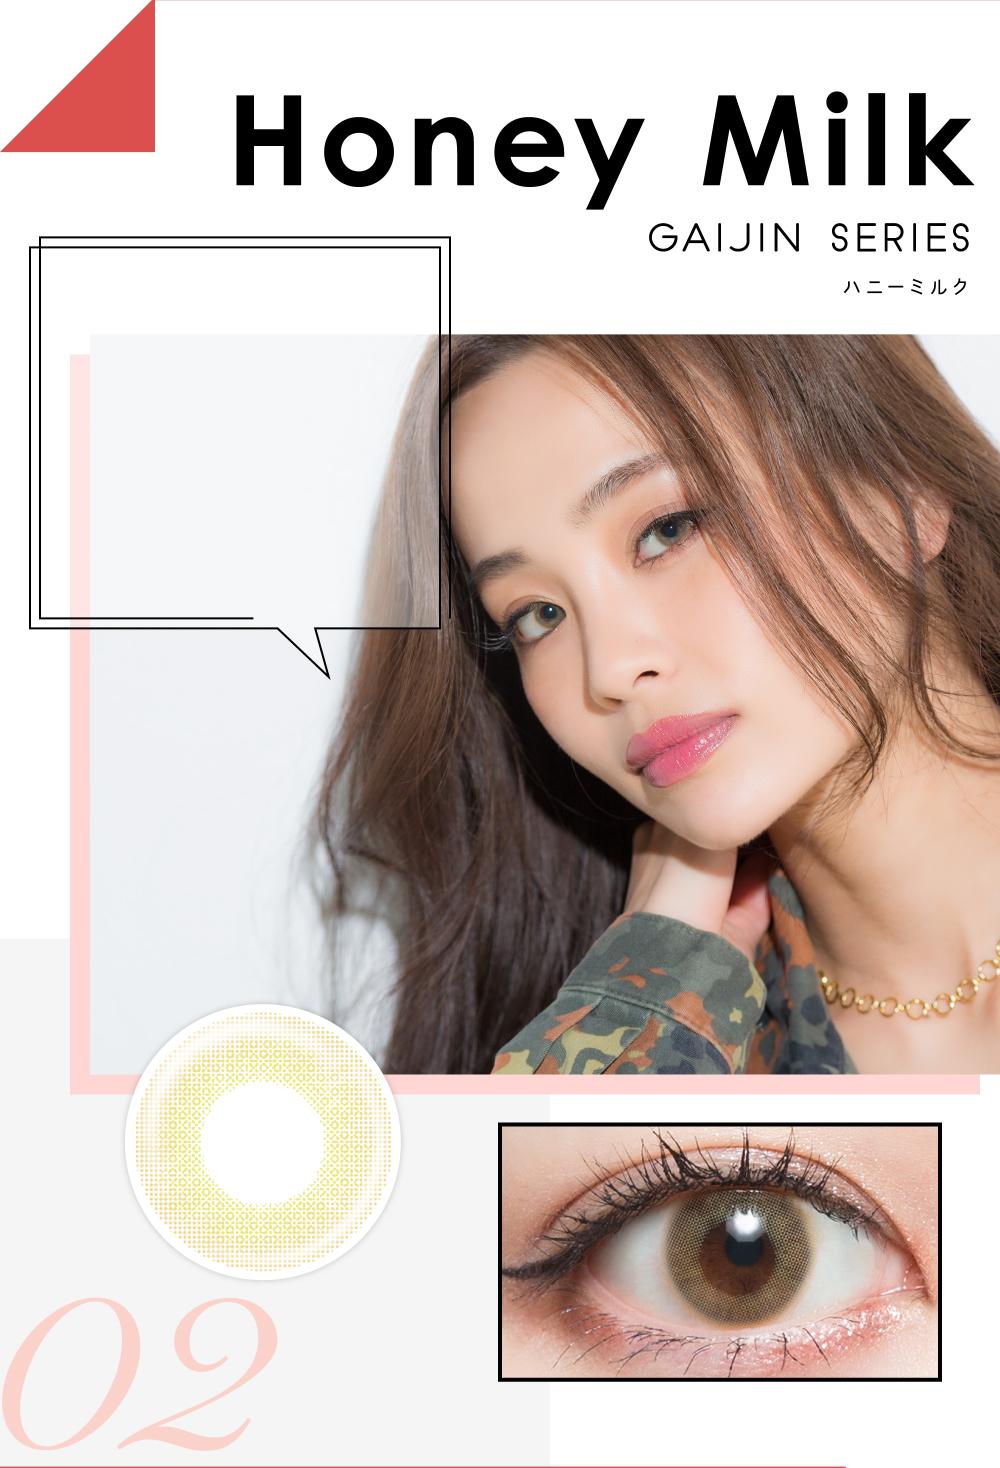 Honey Milk ハニーミルク Gaijin Series